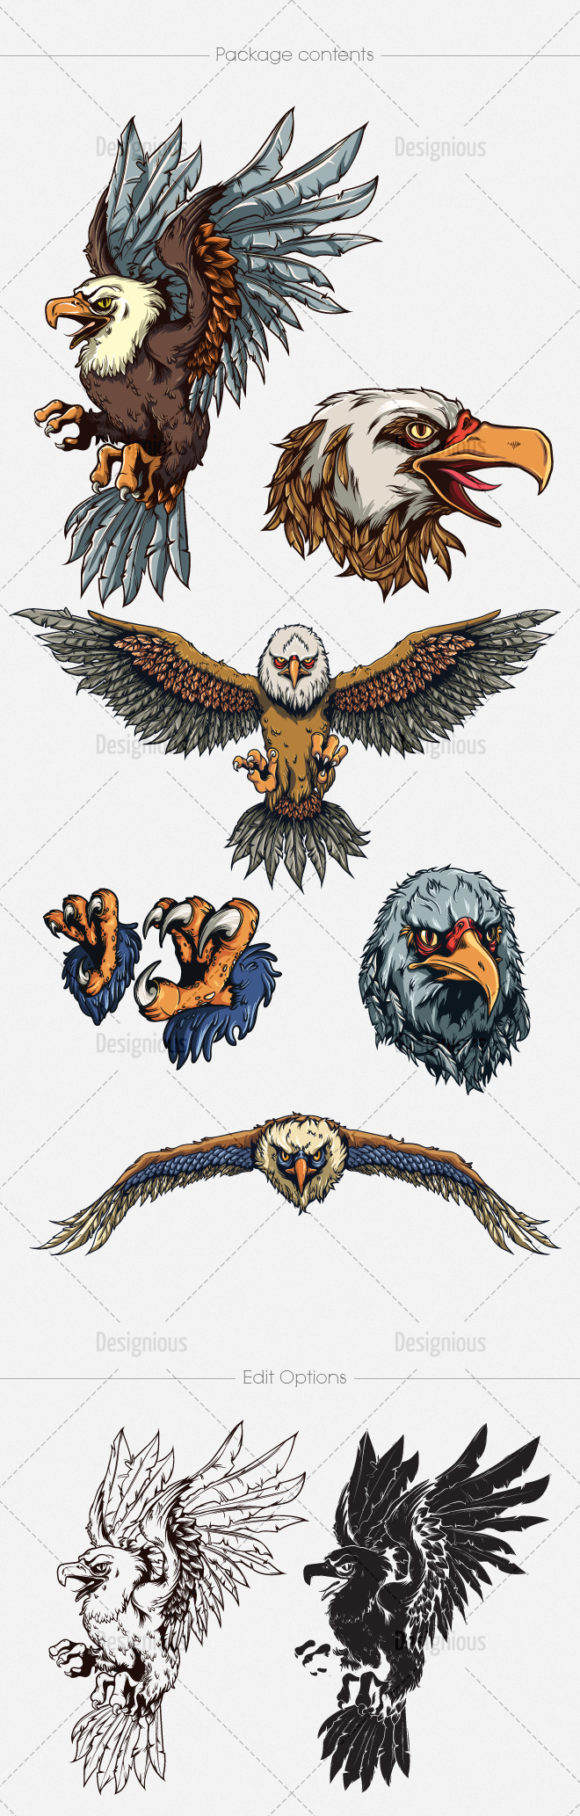 Eagles Vector Pack 1 6